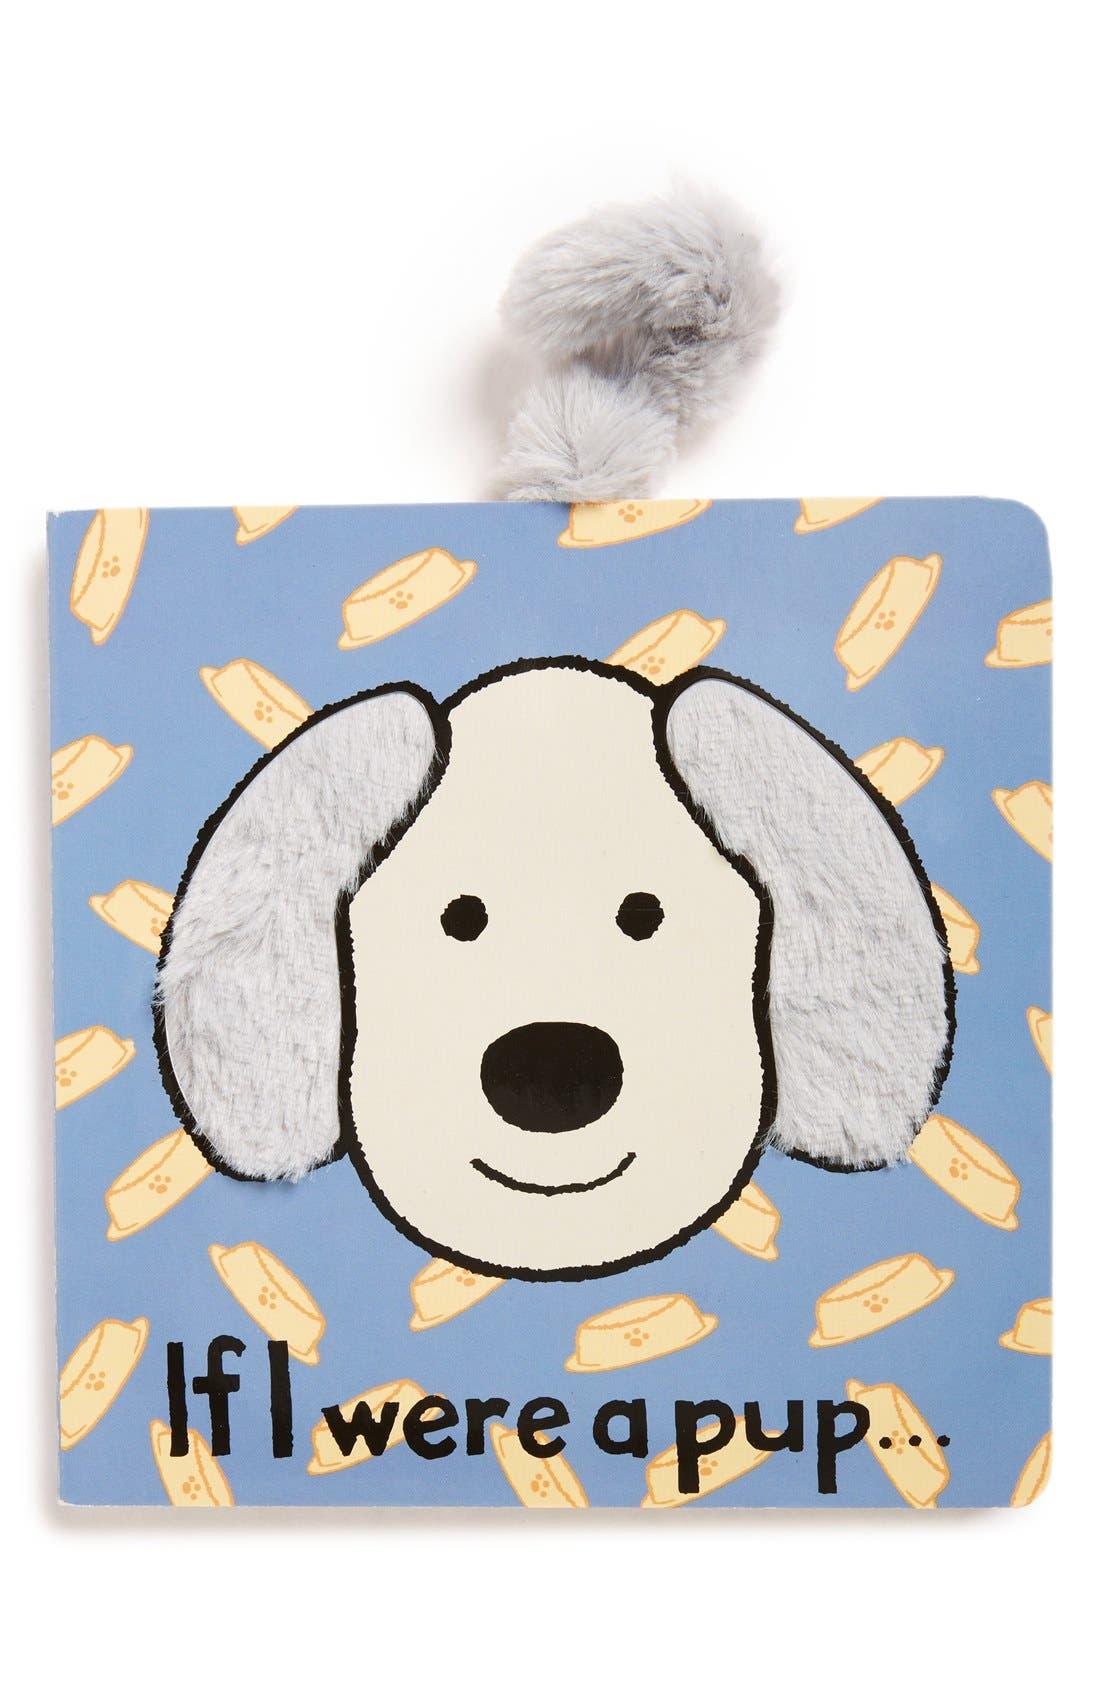 JELLYCAT 'If I Were a Pup' Board Book